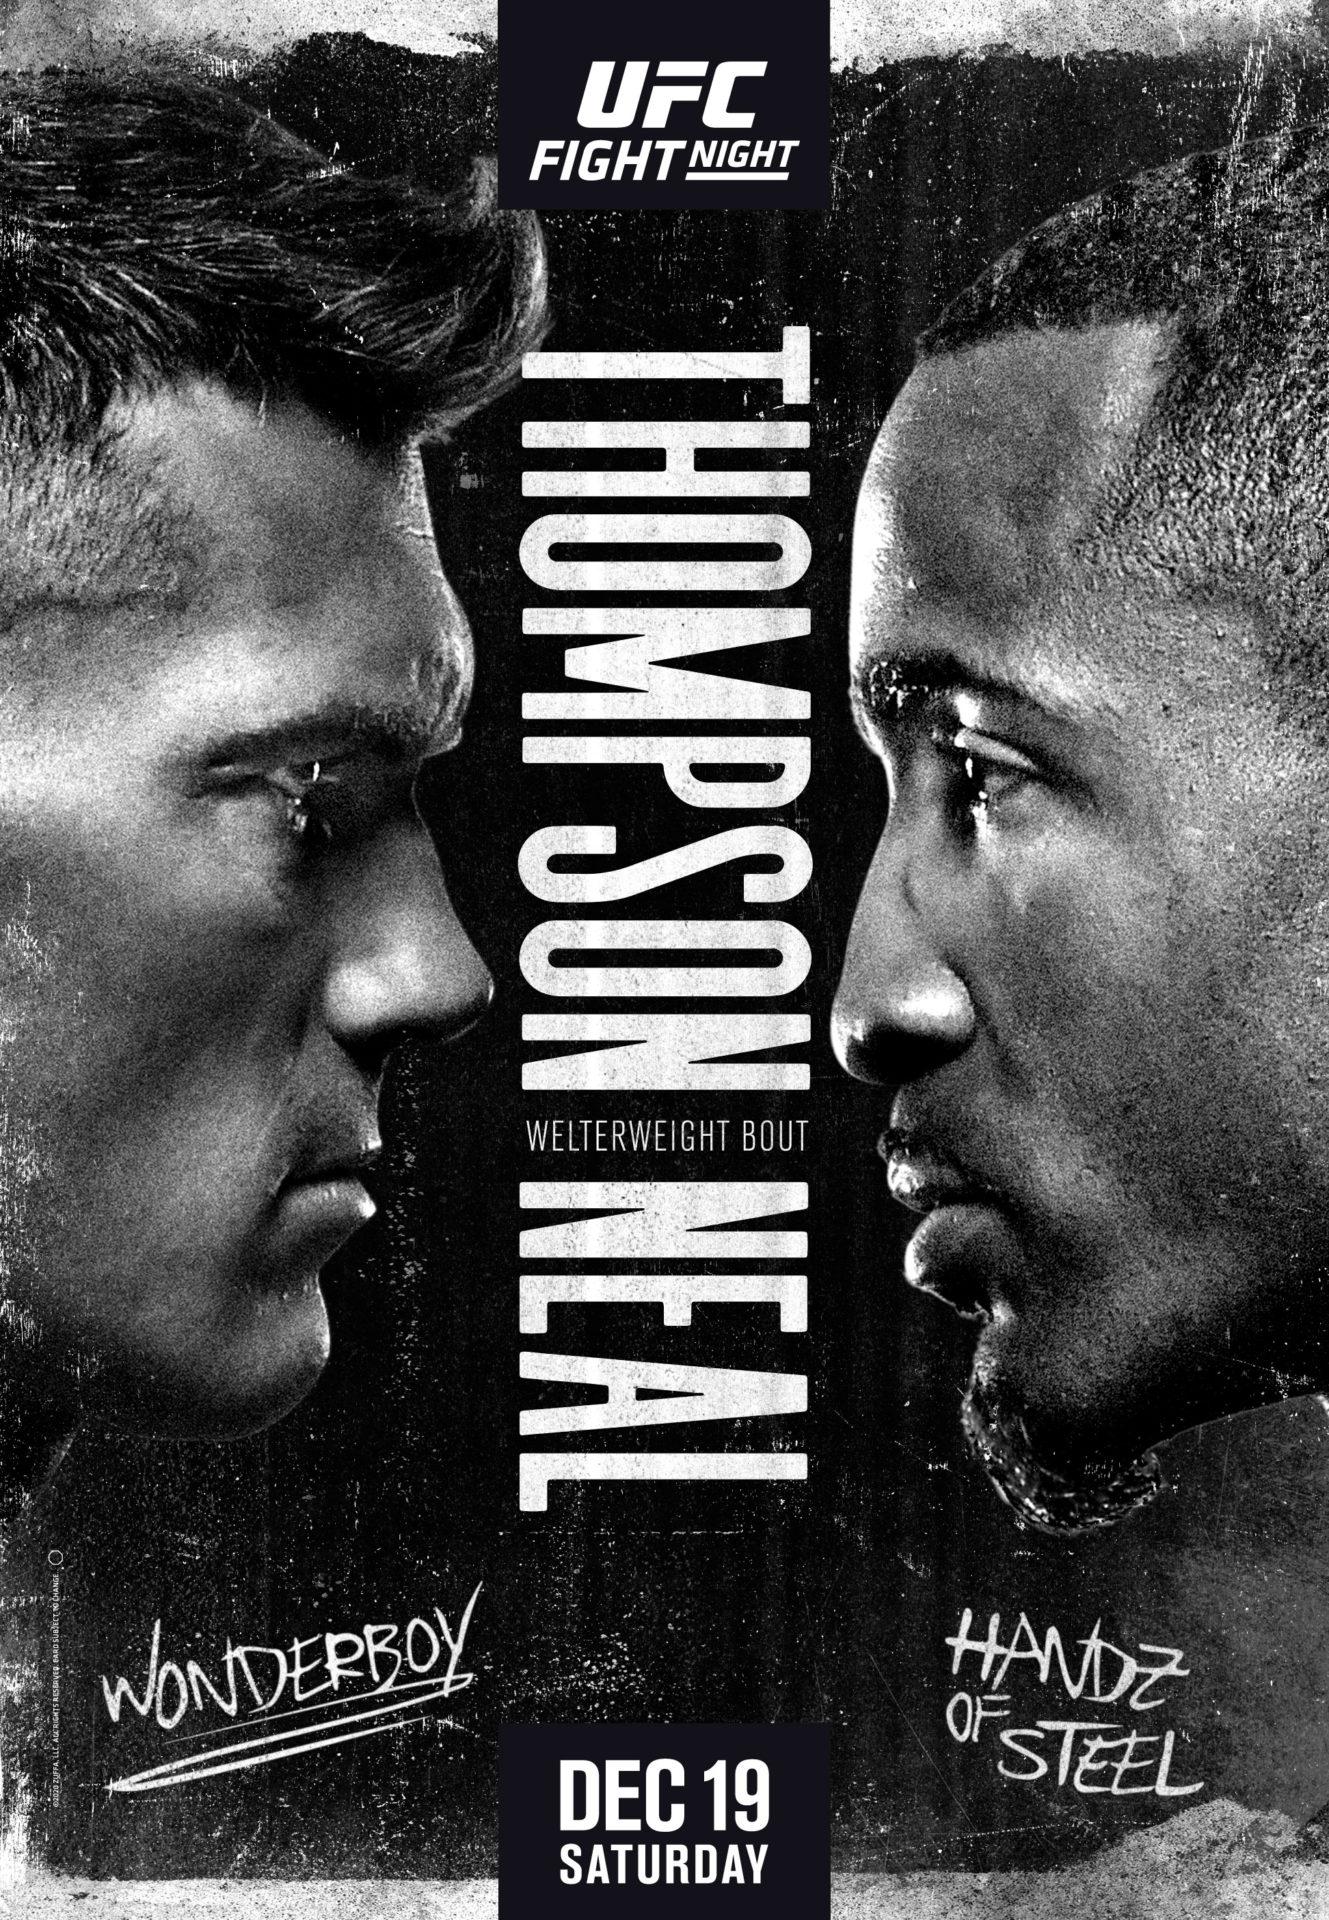 Thompson vs Neal